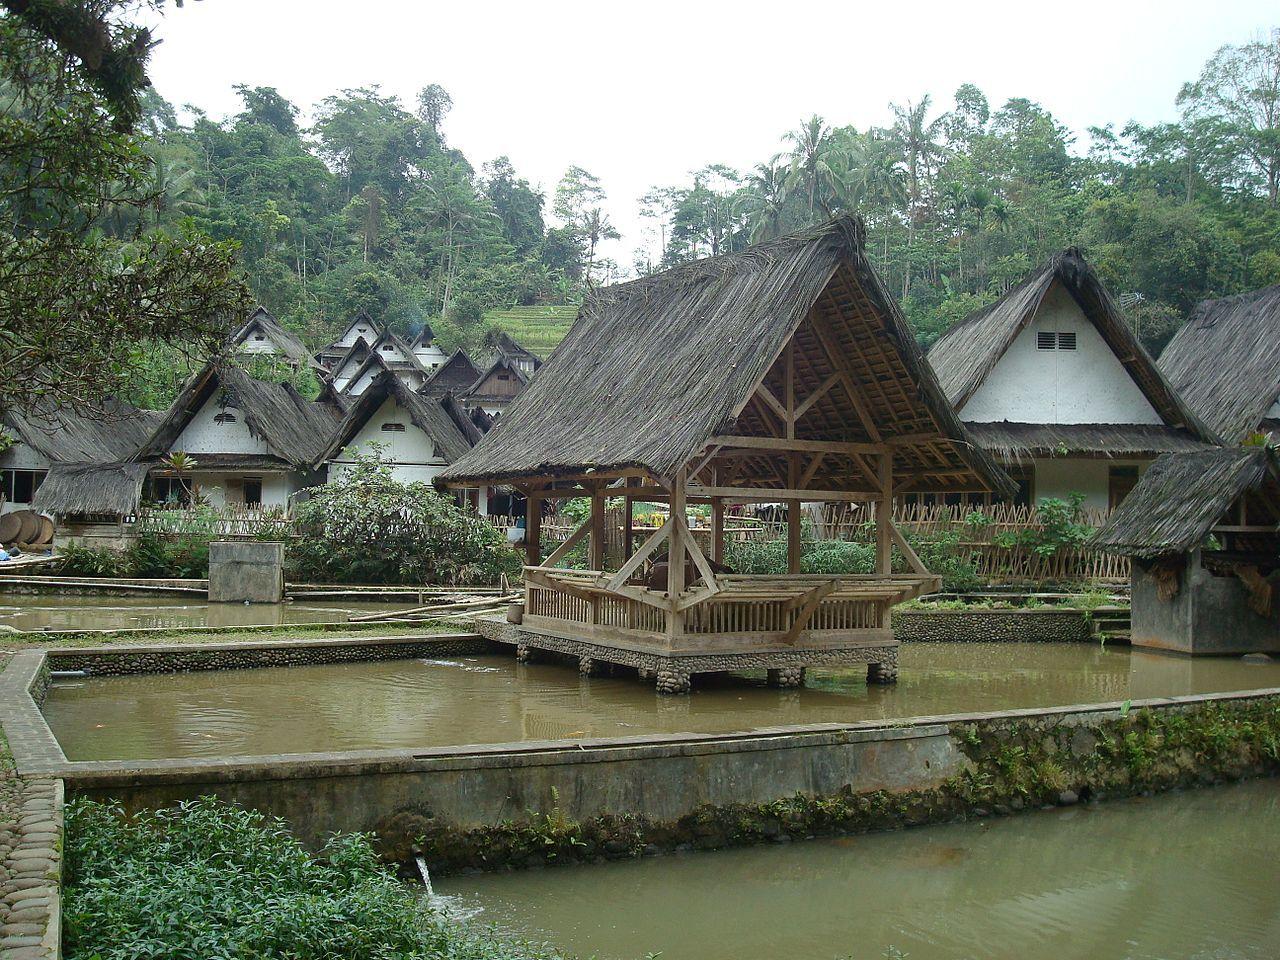 Kampung Naga Java110 Rumah adat Wikipedia House